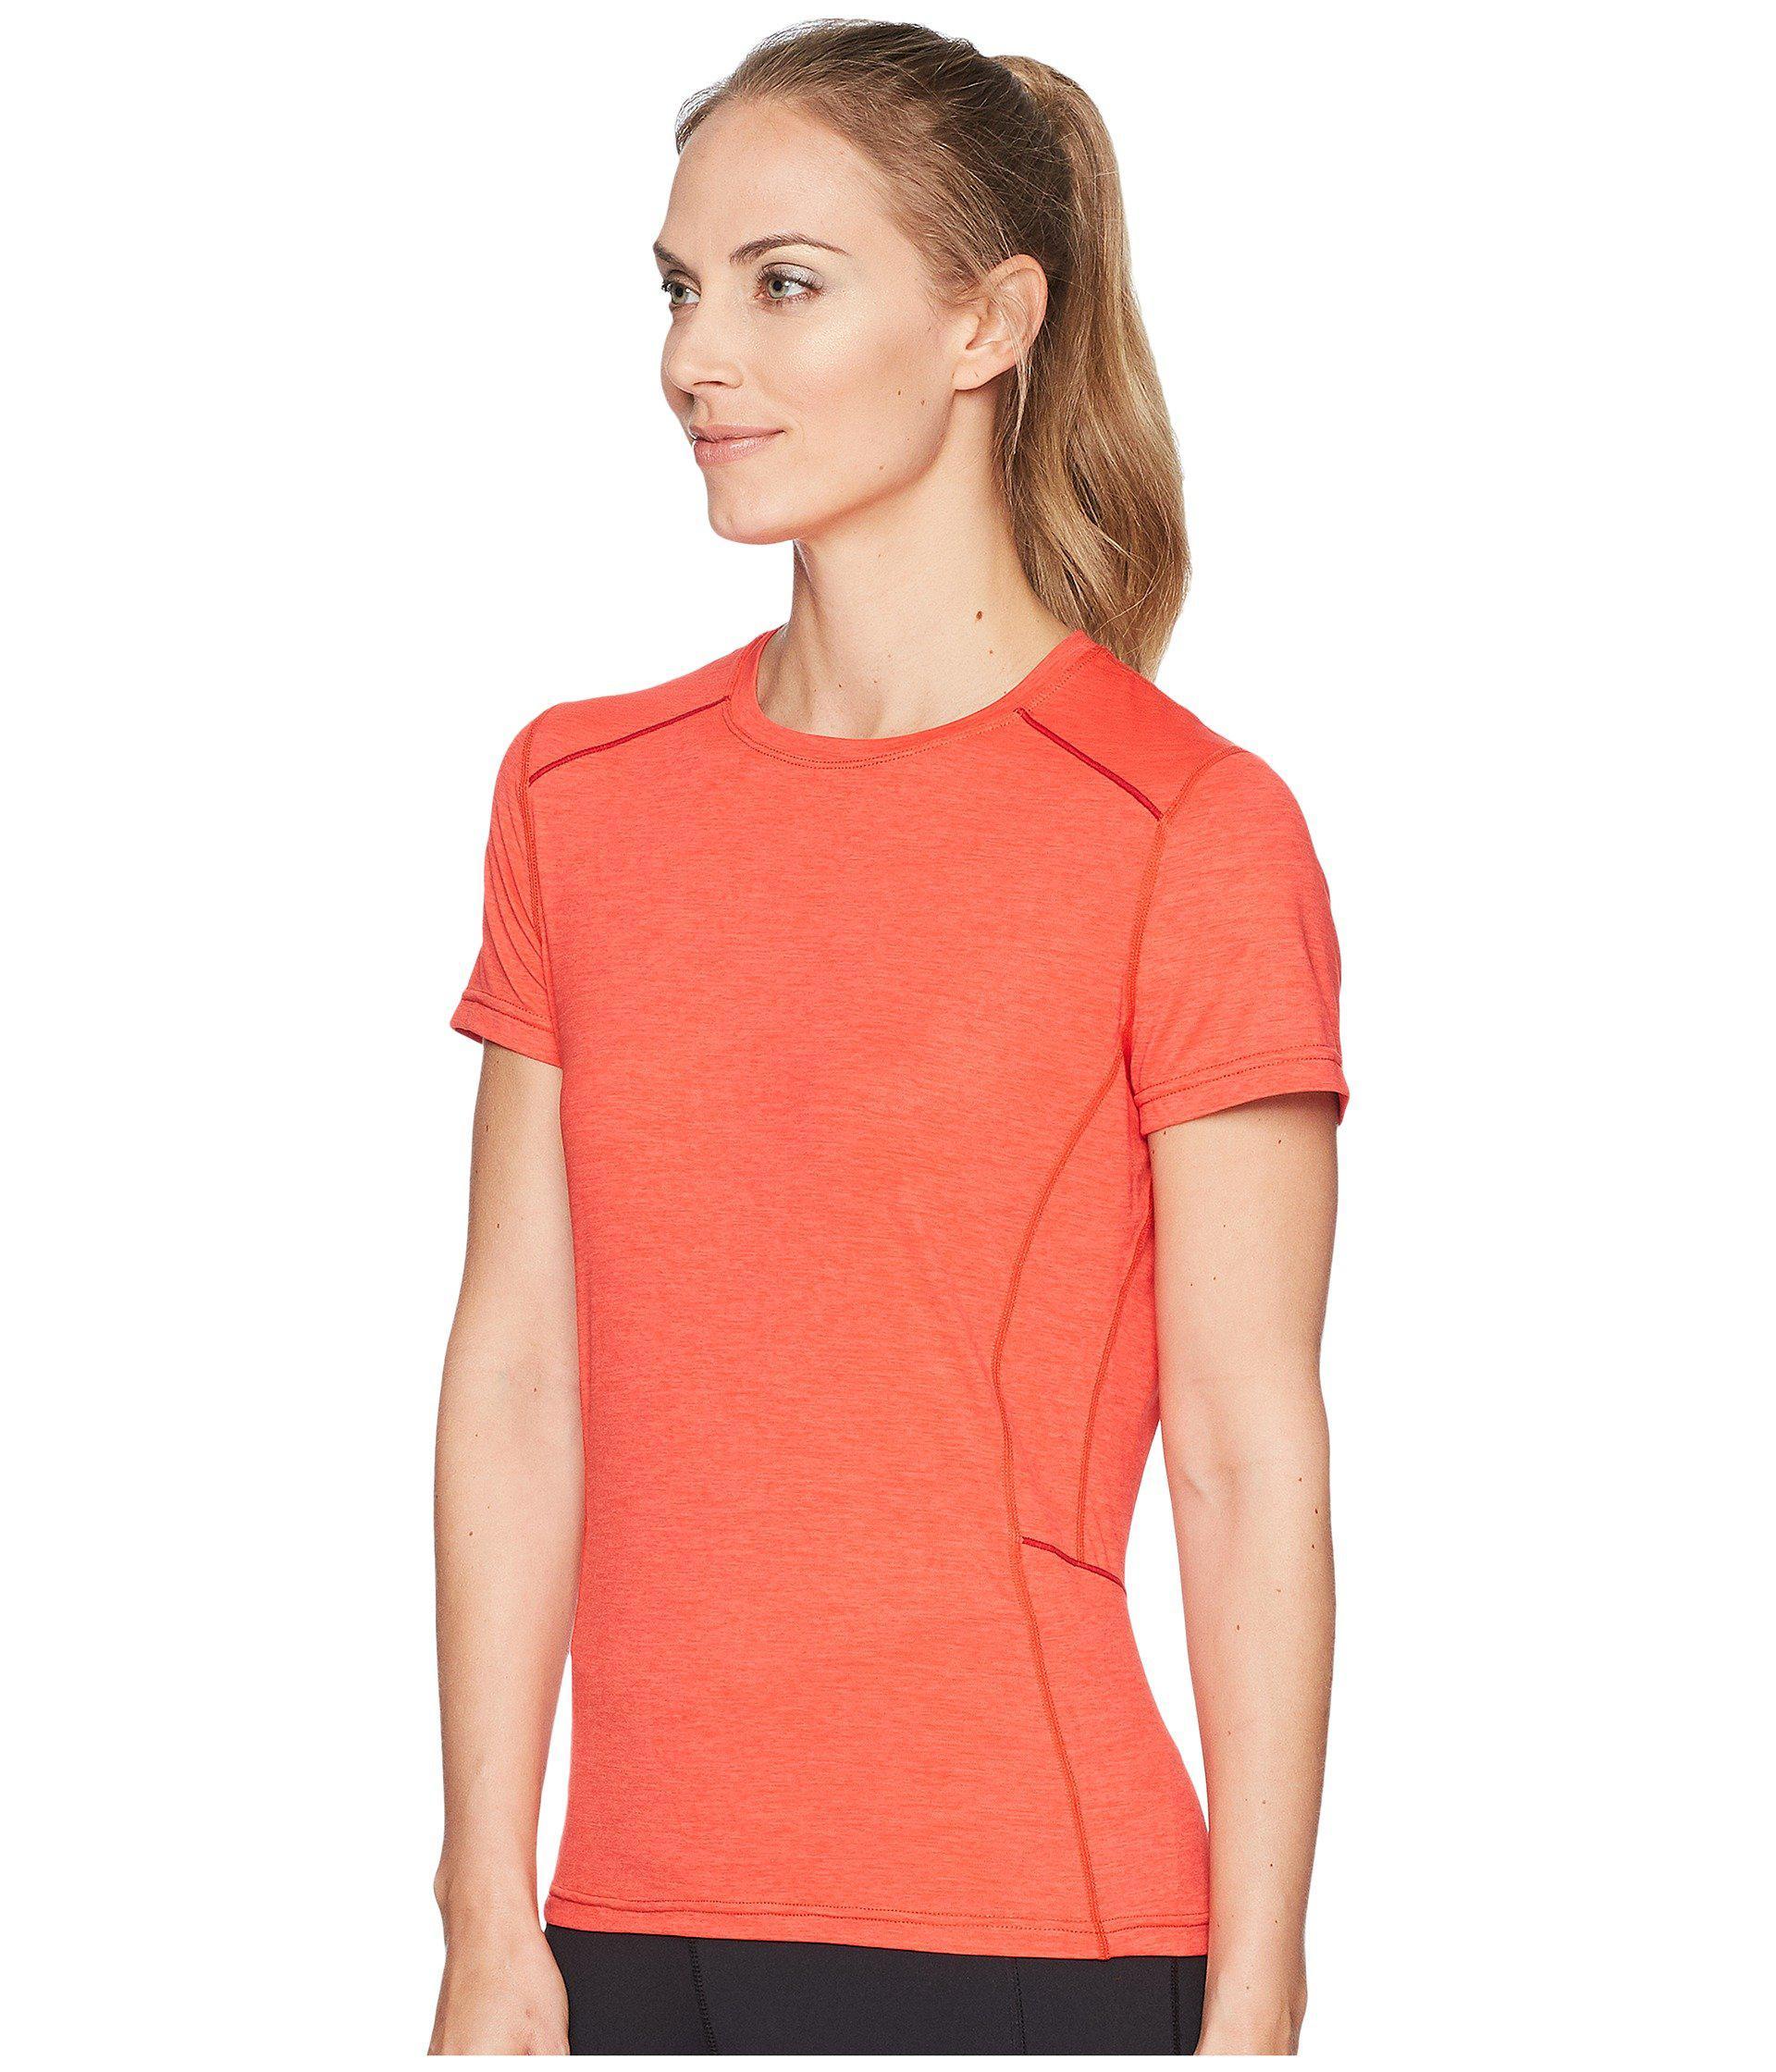 1aaddbb674786b Lyst - Prana Eileen Sun Top Short Sleeve in Pink - Save 43%